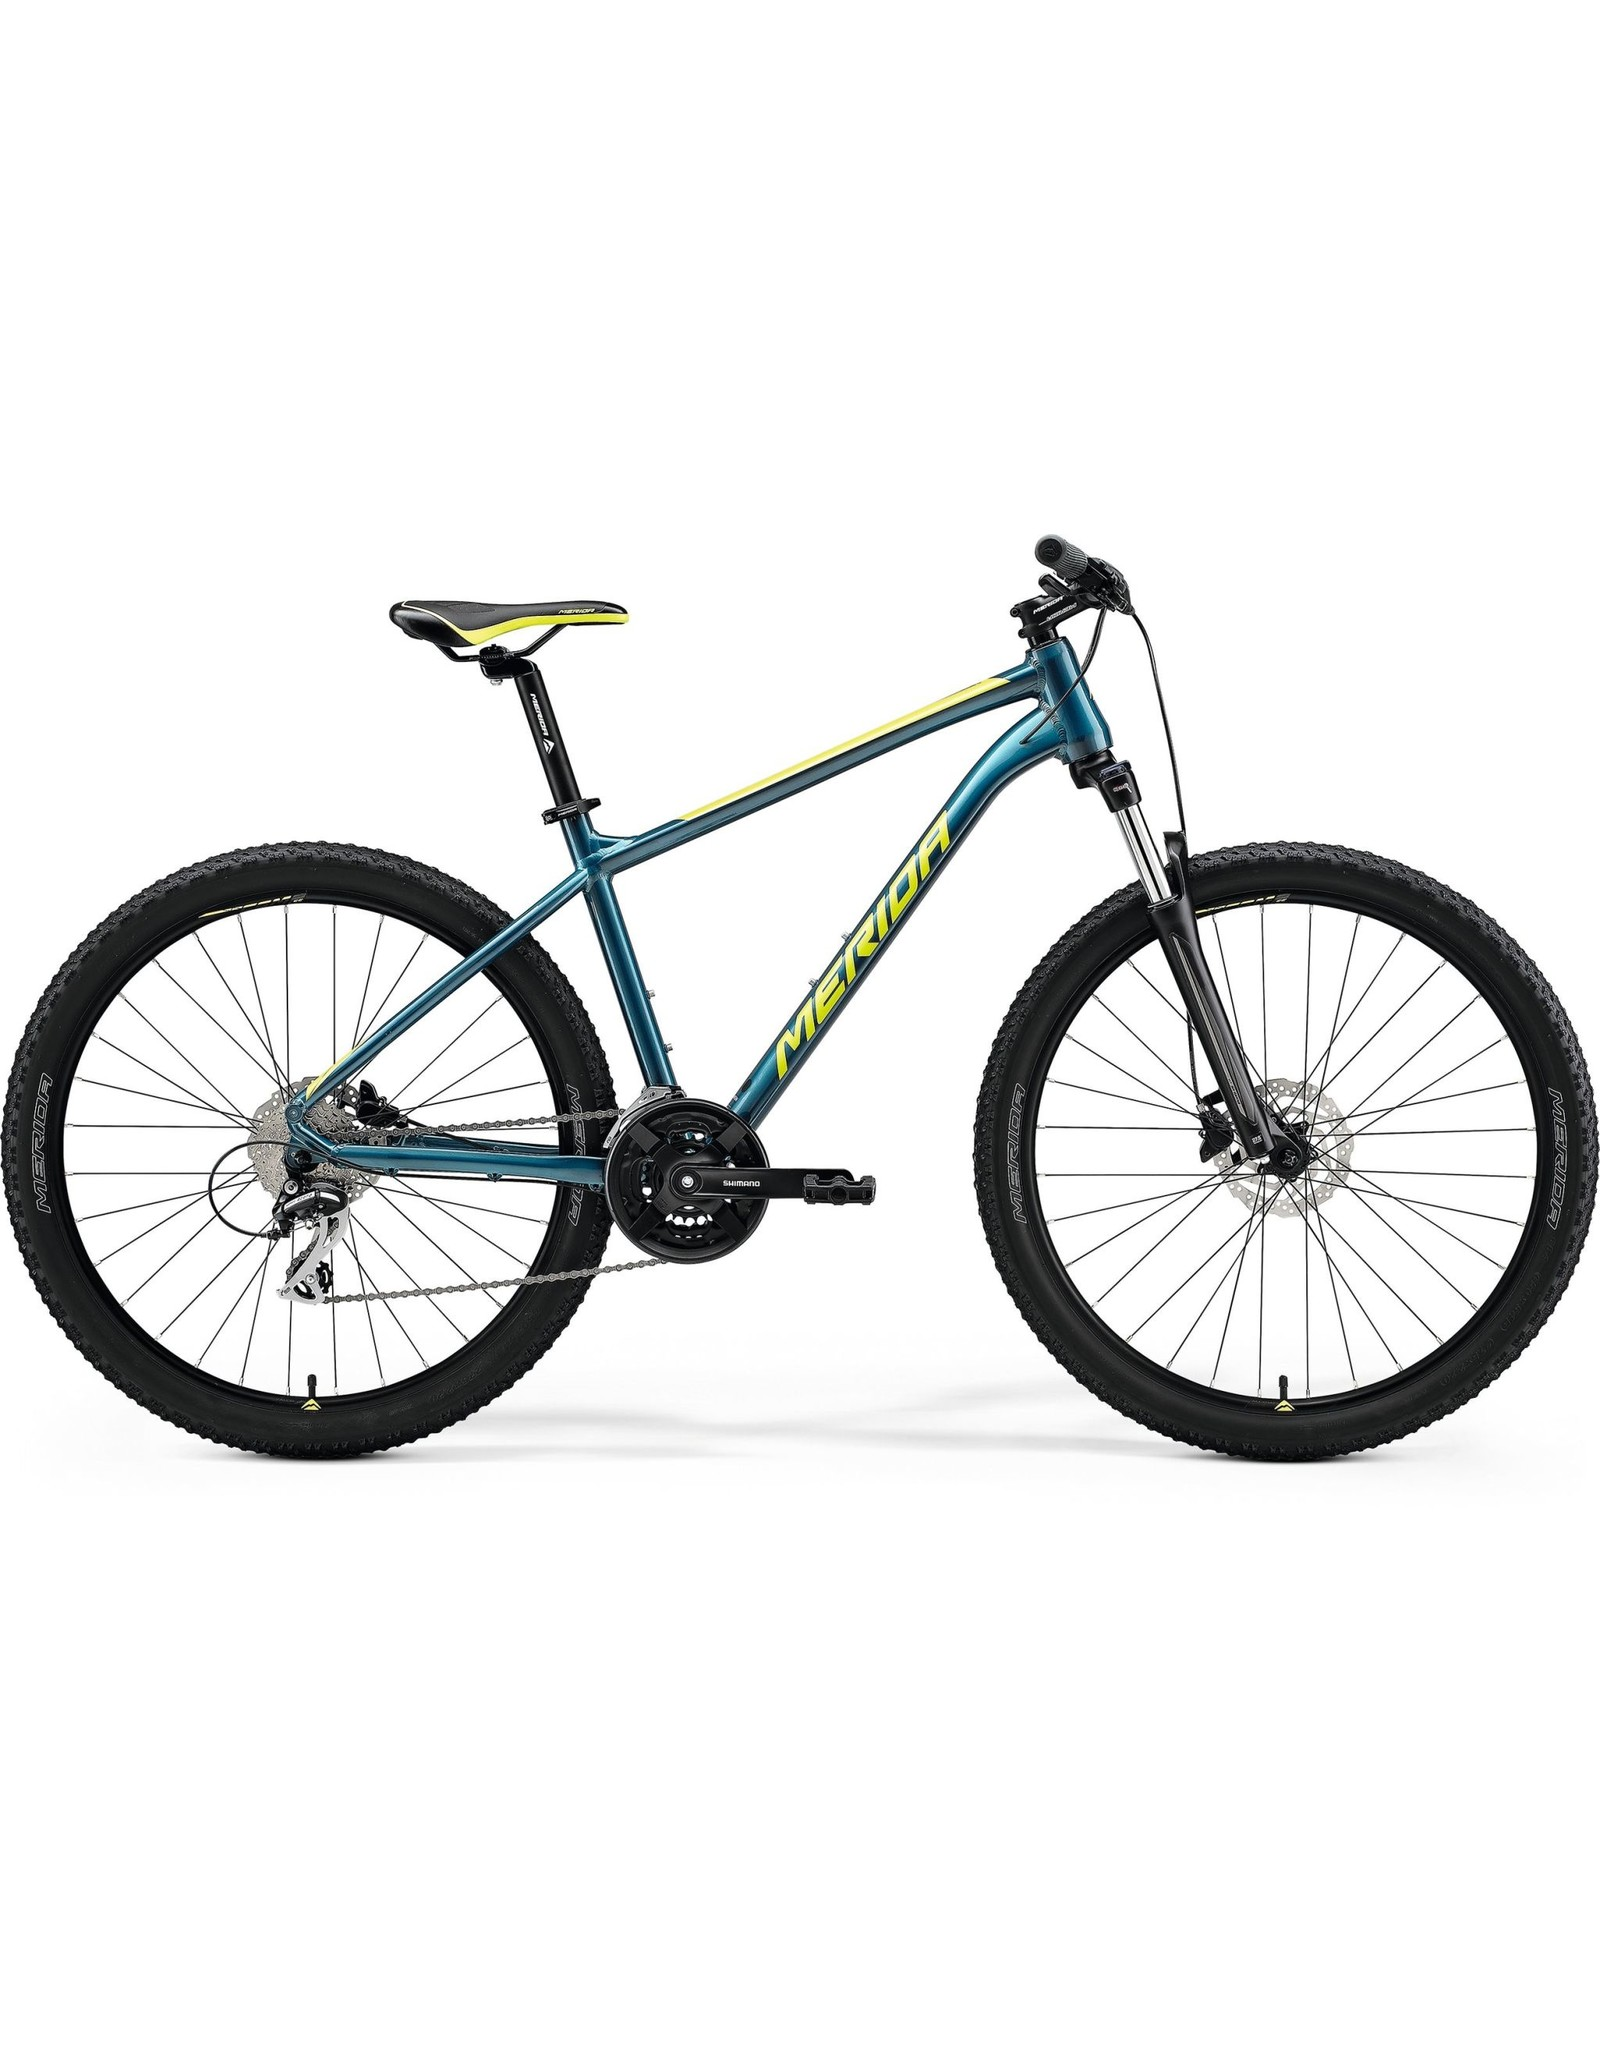 "Merida Big Seven  Mountain Bike 20 2x 27.5"" 2021"